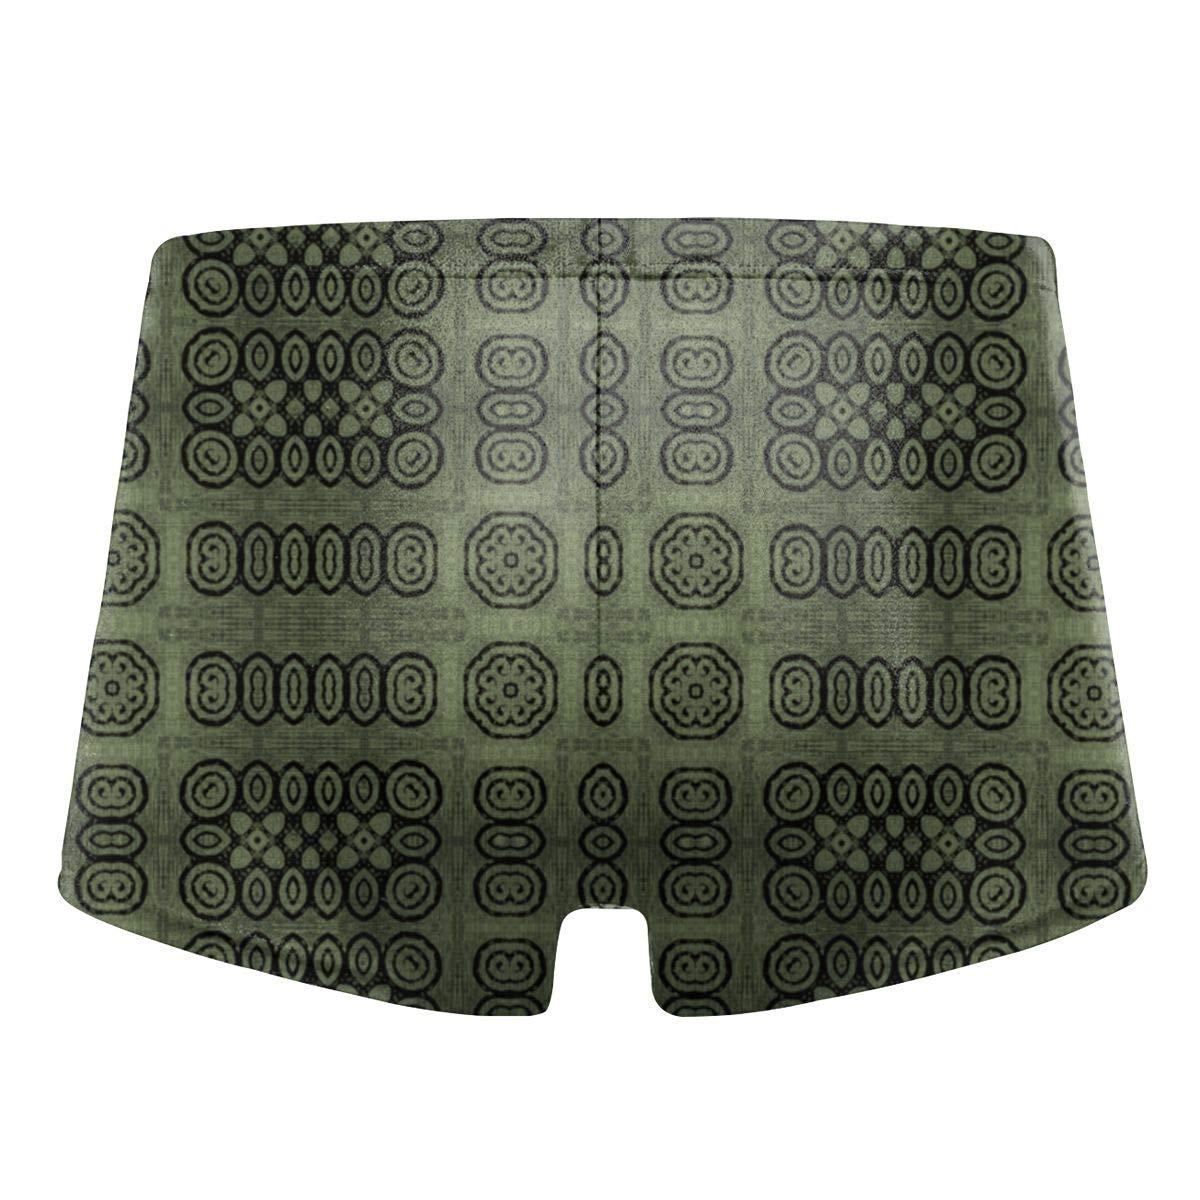 Mens Swim Trunks Shorts Athletic Swimwear Briefs Boardshorts 8359 349tg1u Ikat Sage Primitive Print Wallpaper